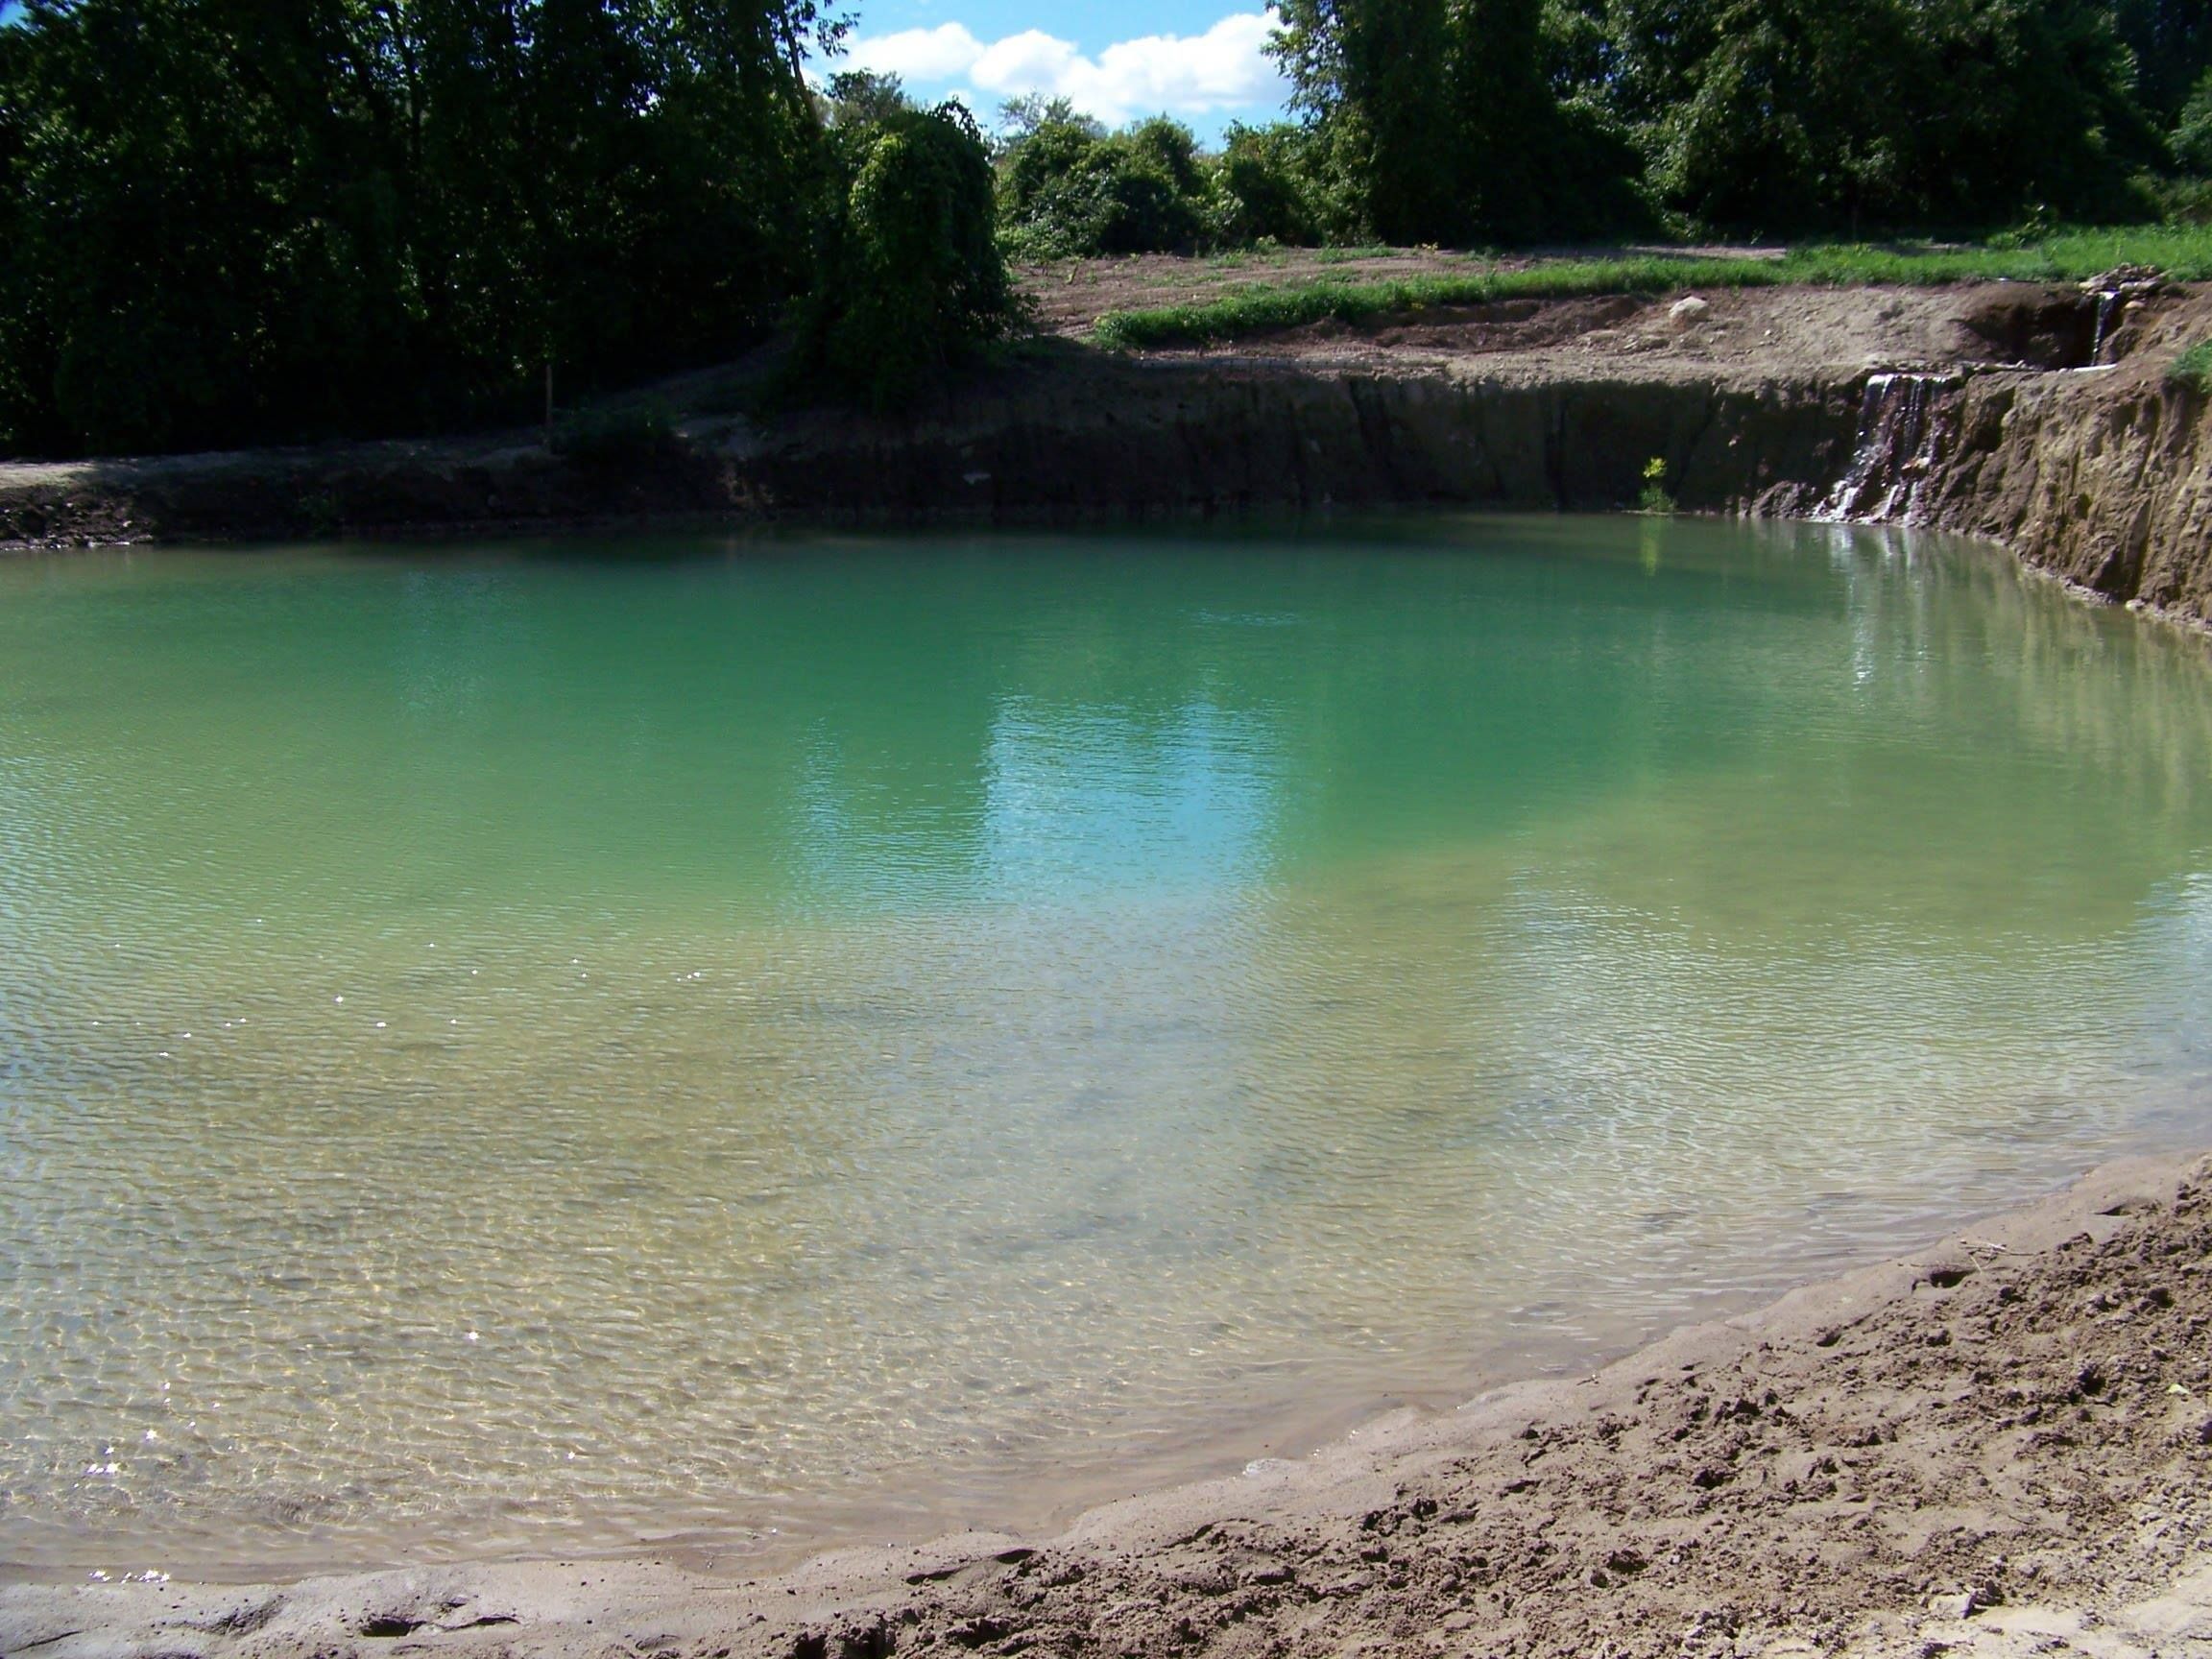 Build Backyard Lazy River : backyard lazy rivers  Dancing Waters (AngeL) IDs  Pinterest